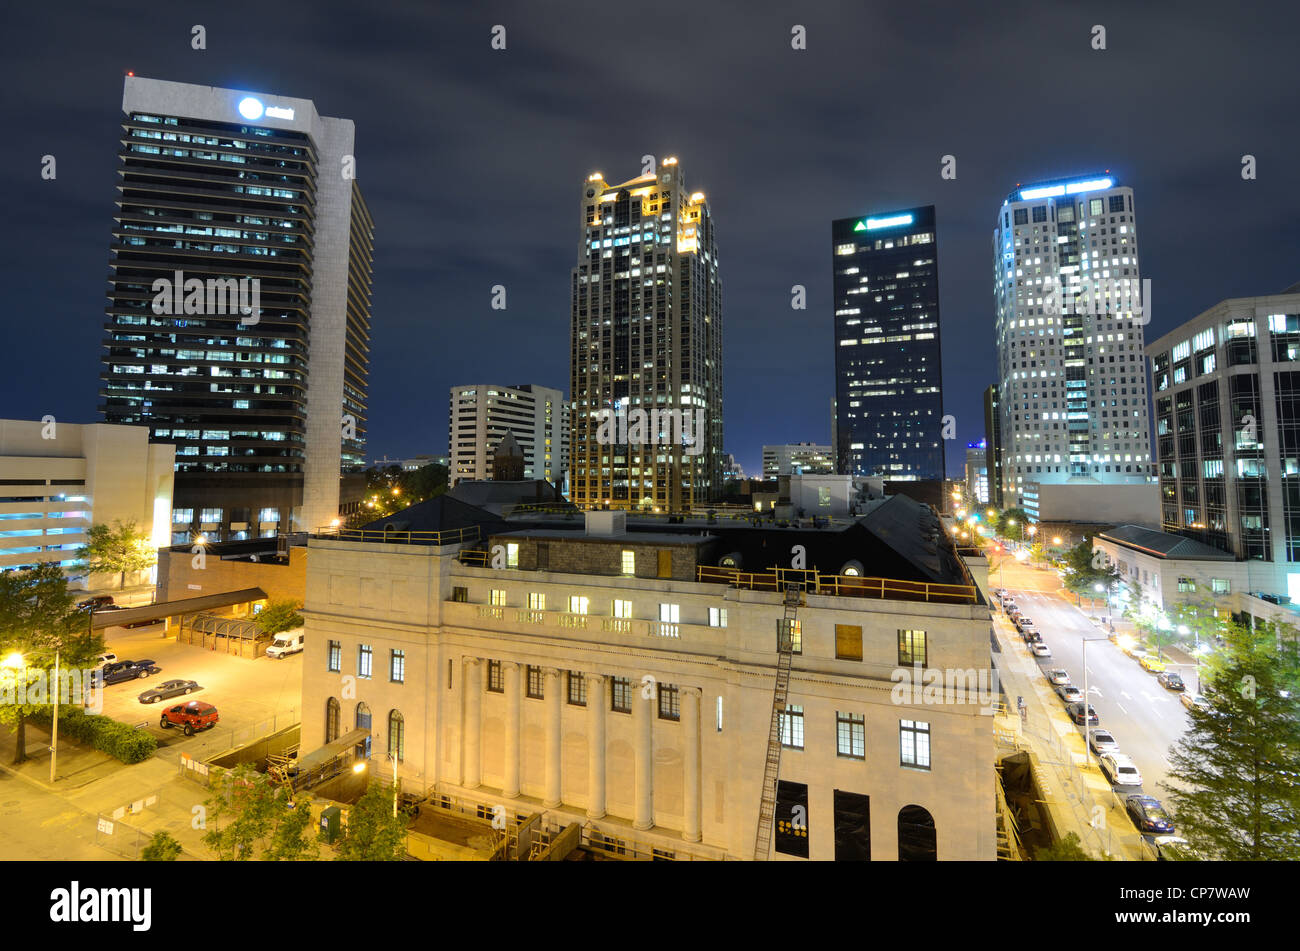 Metropolitan Skyline of downtown Birmingham, Alabama, USA. - Stock Image